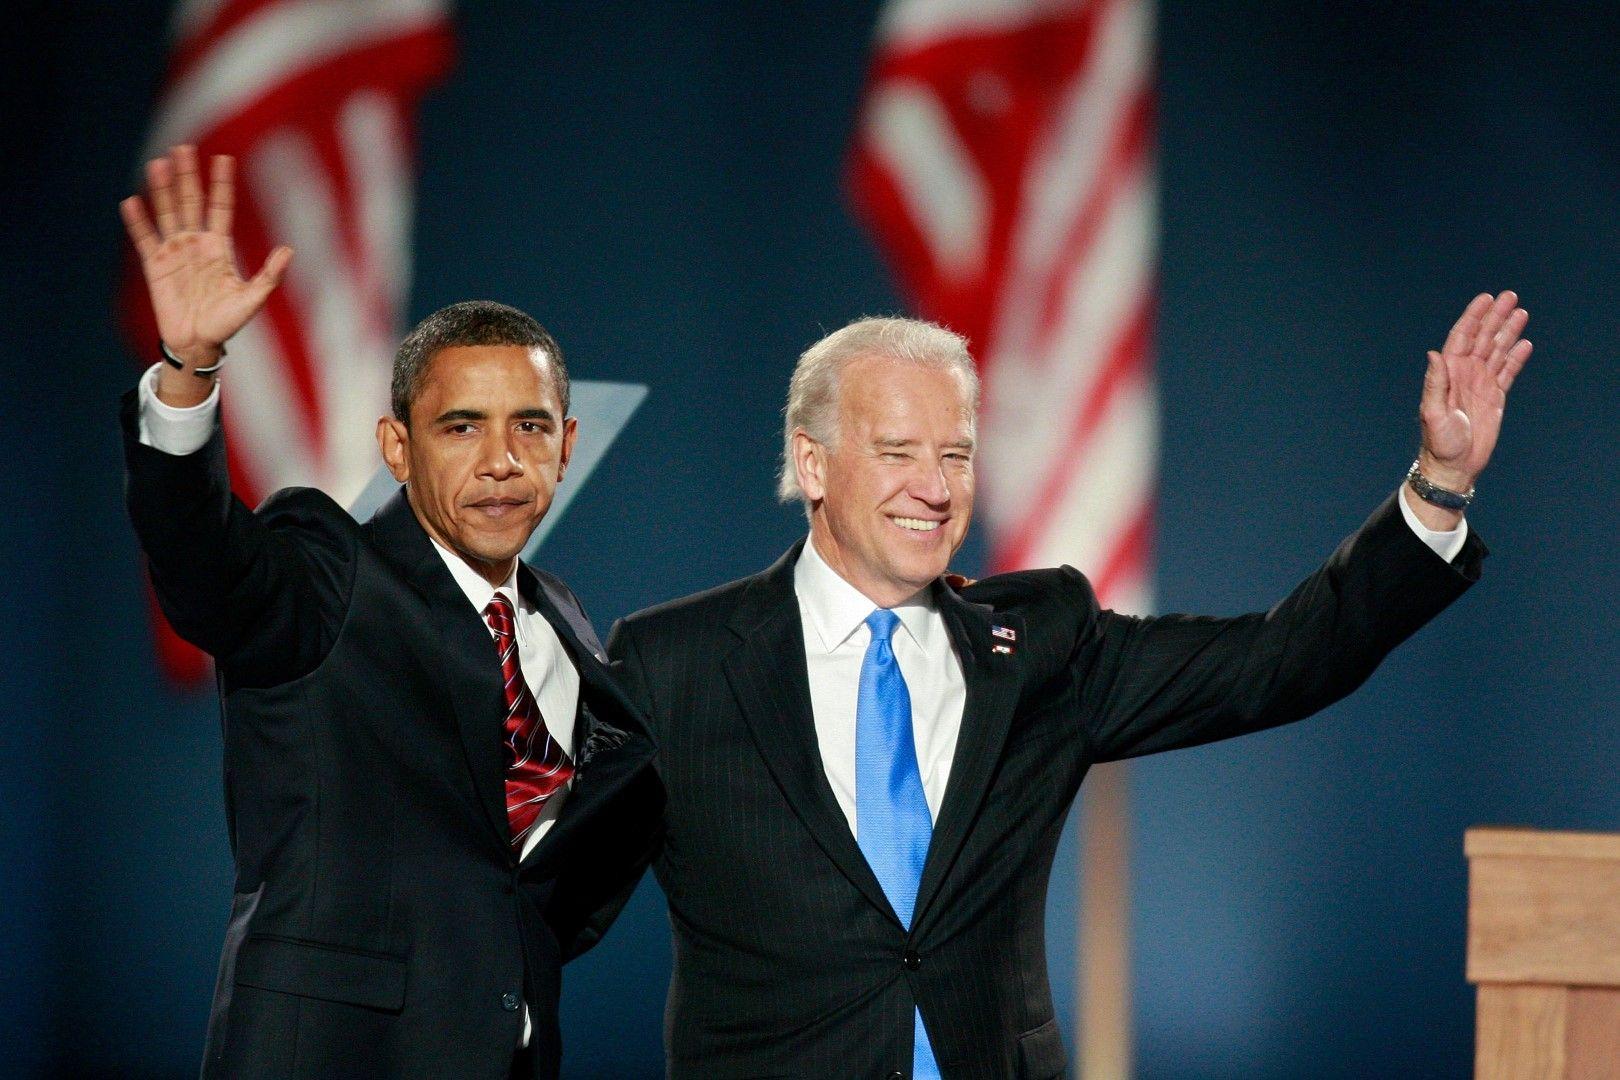 Новоизбраните президент и вицепрезидент Барак Обама и Джо Байдън